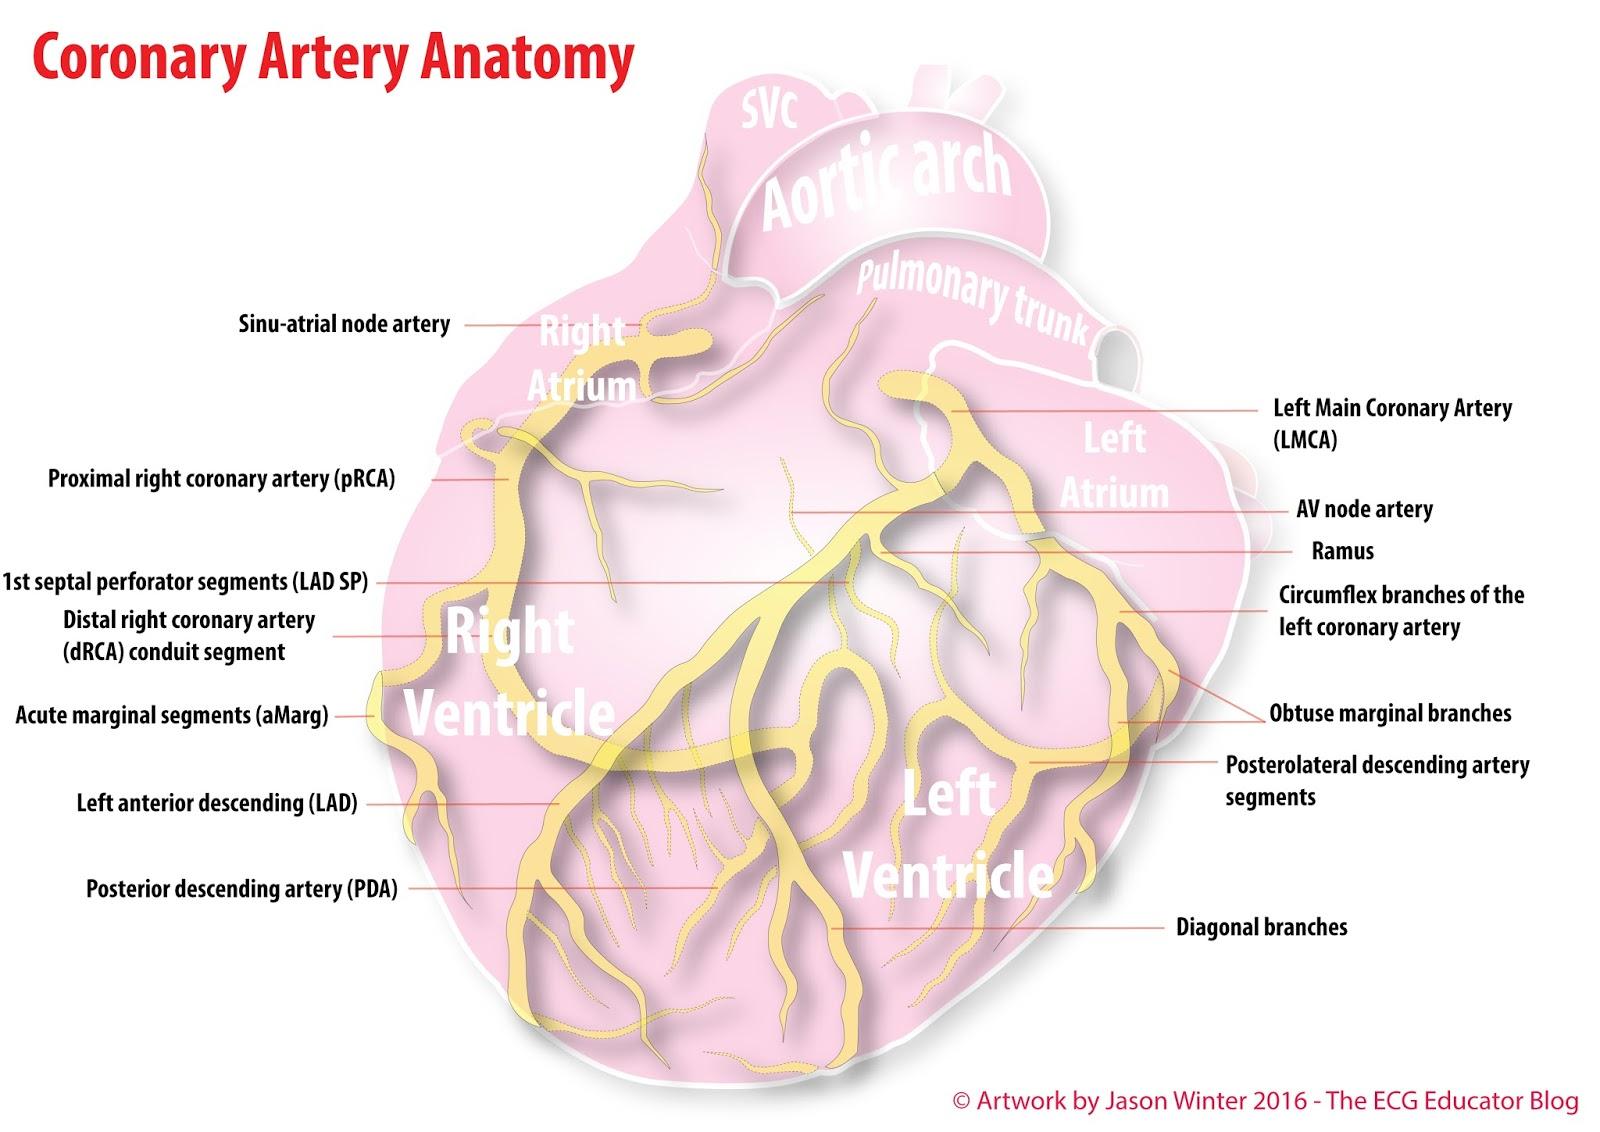 ECG Educator Blog : Coronary Artery Anatomy